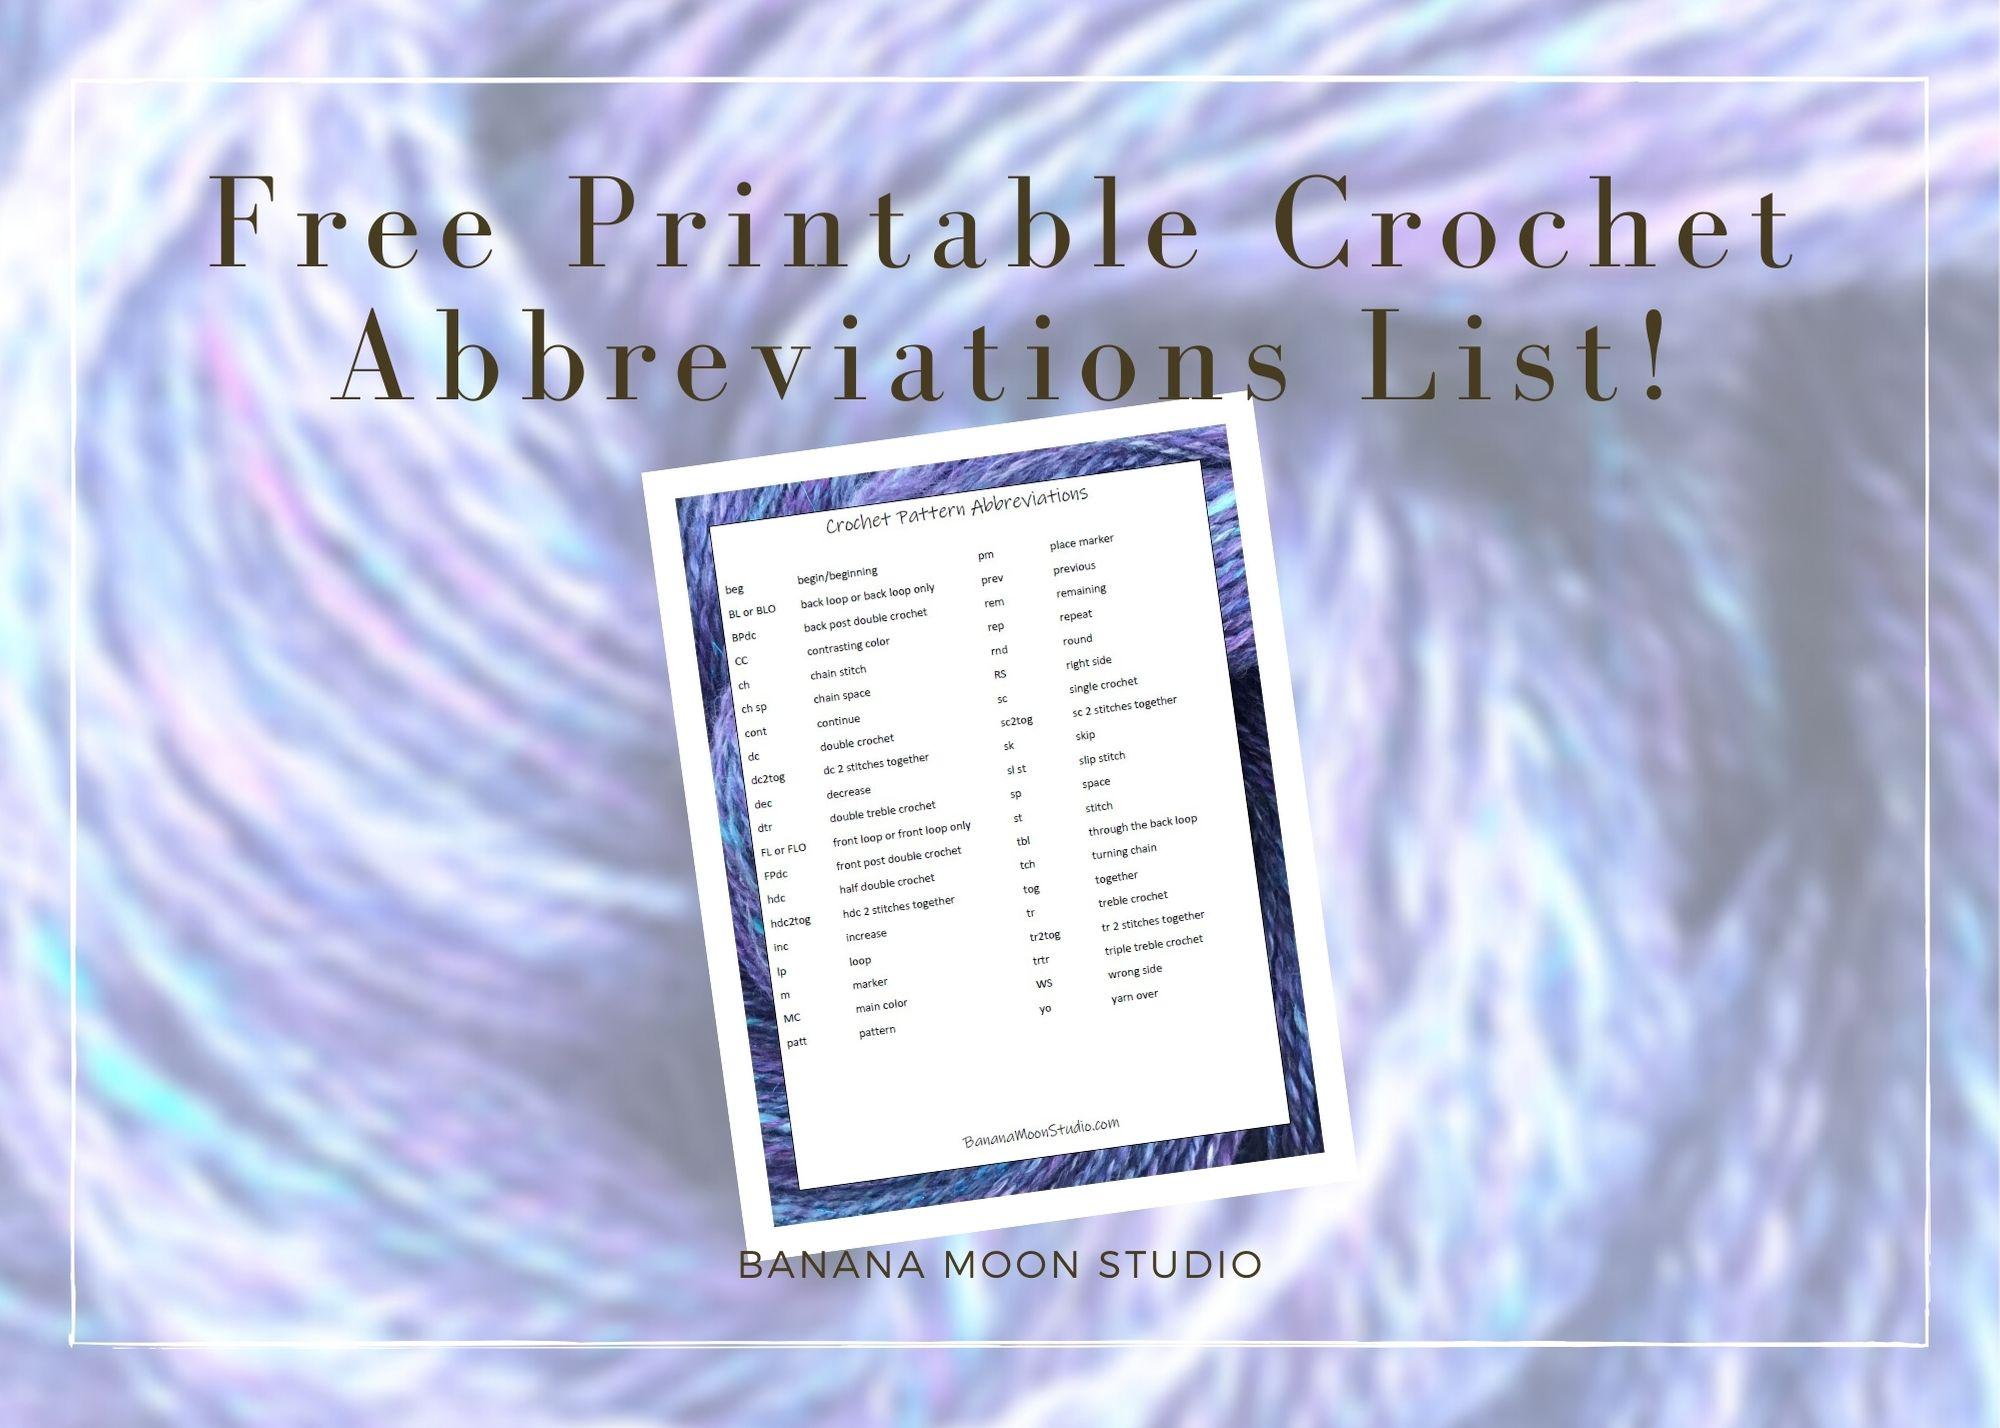 Get this free printable crochet abbreviations list from Banana Moon Studio!